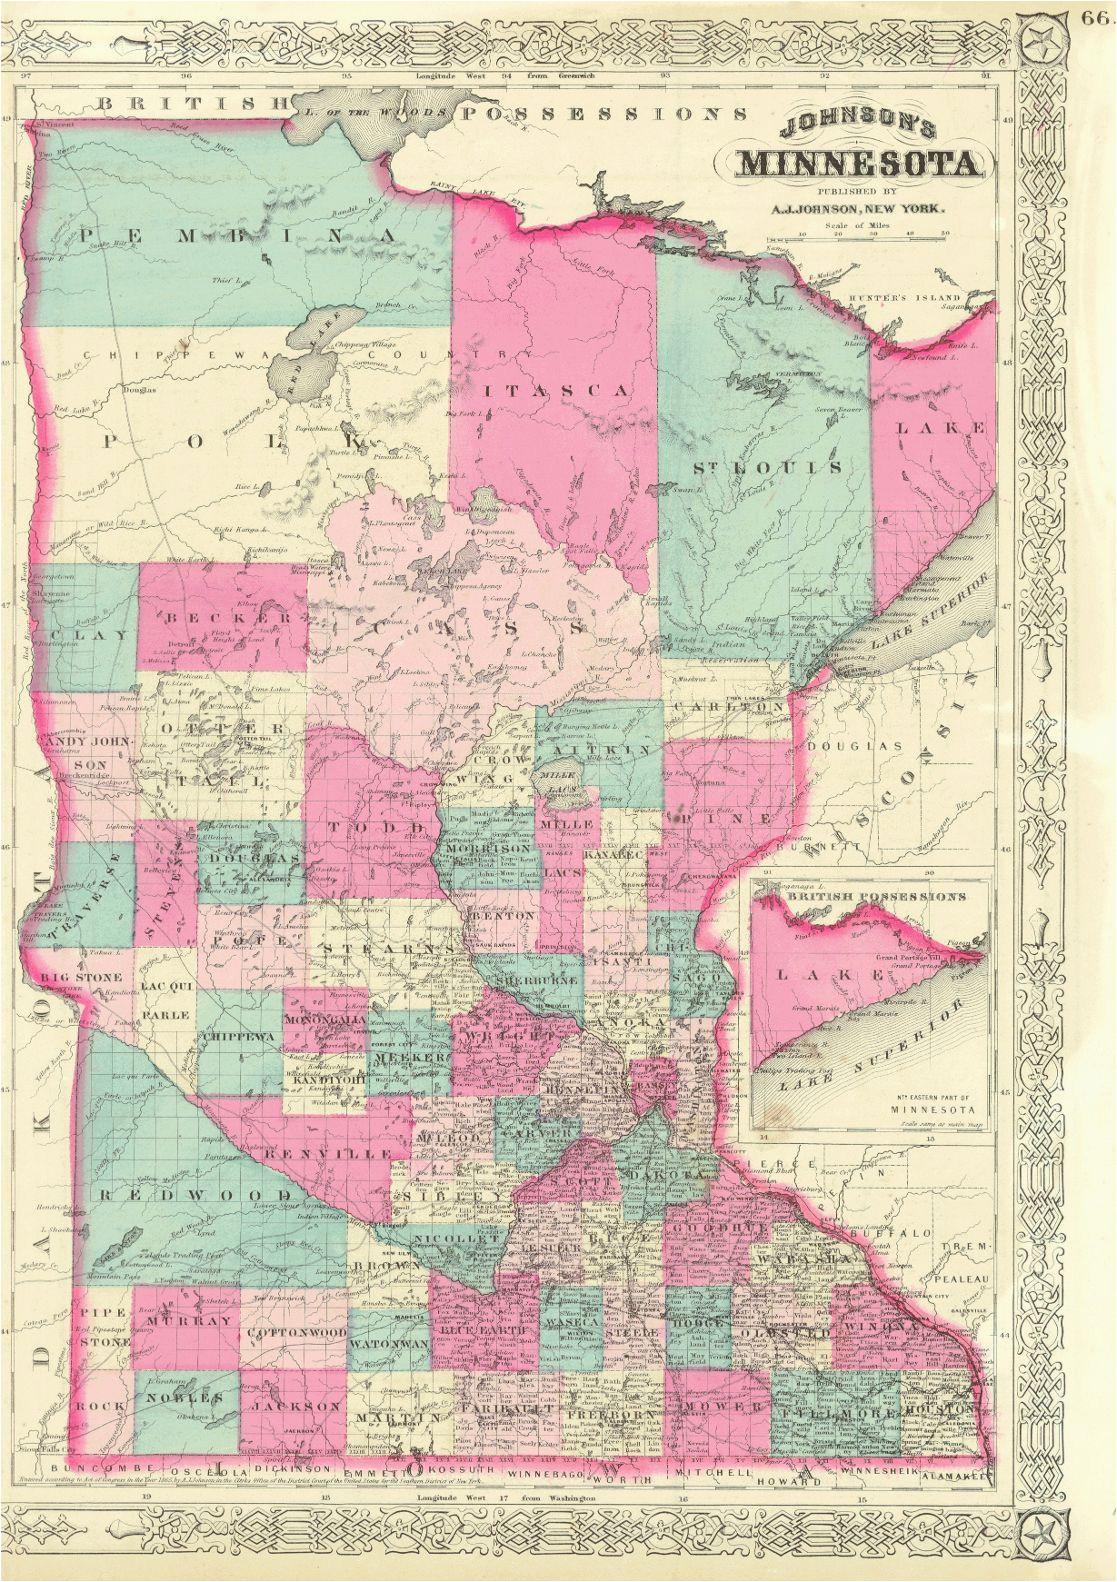 Map Of northern Minnesota 1852 Mitchell Minnesota Territory Map before north or south Dakota